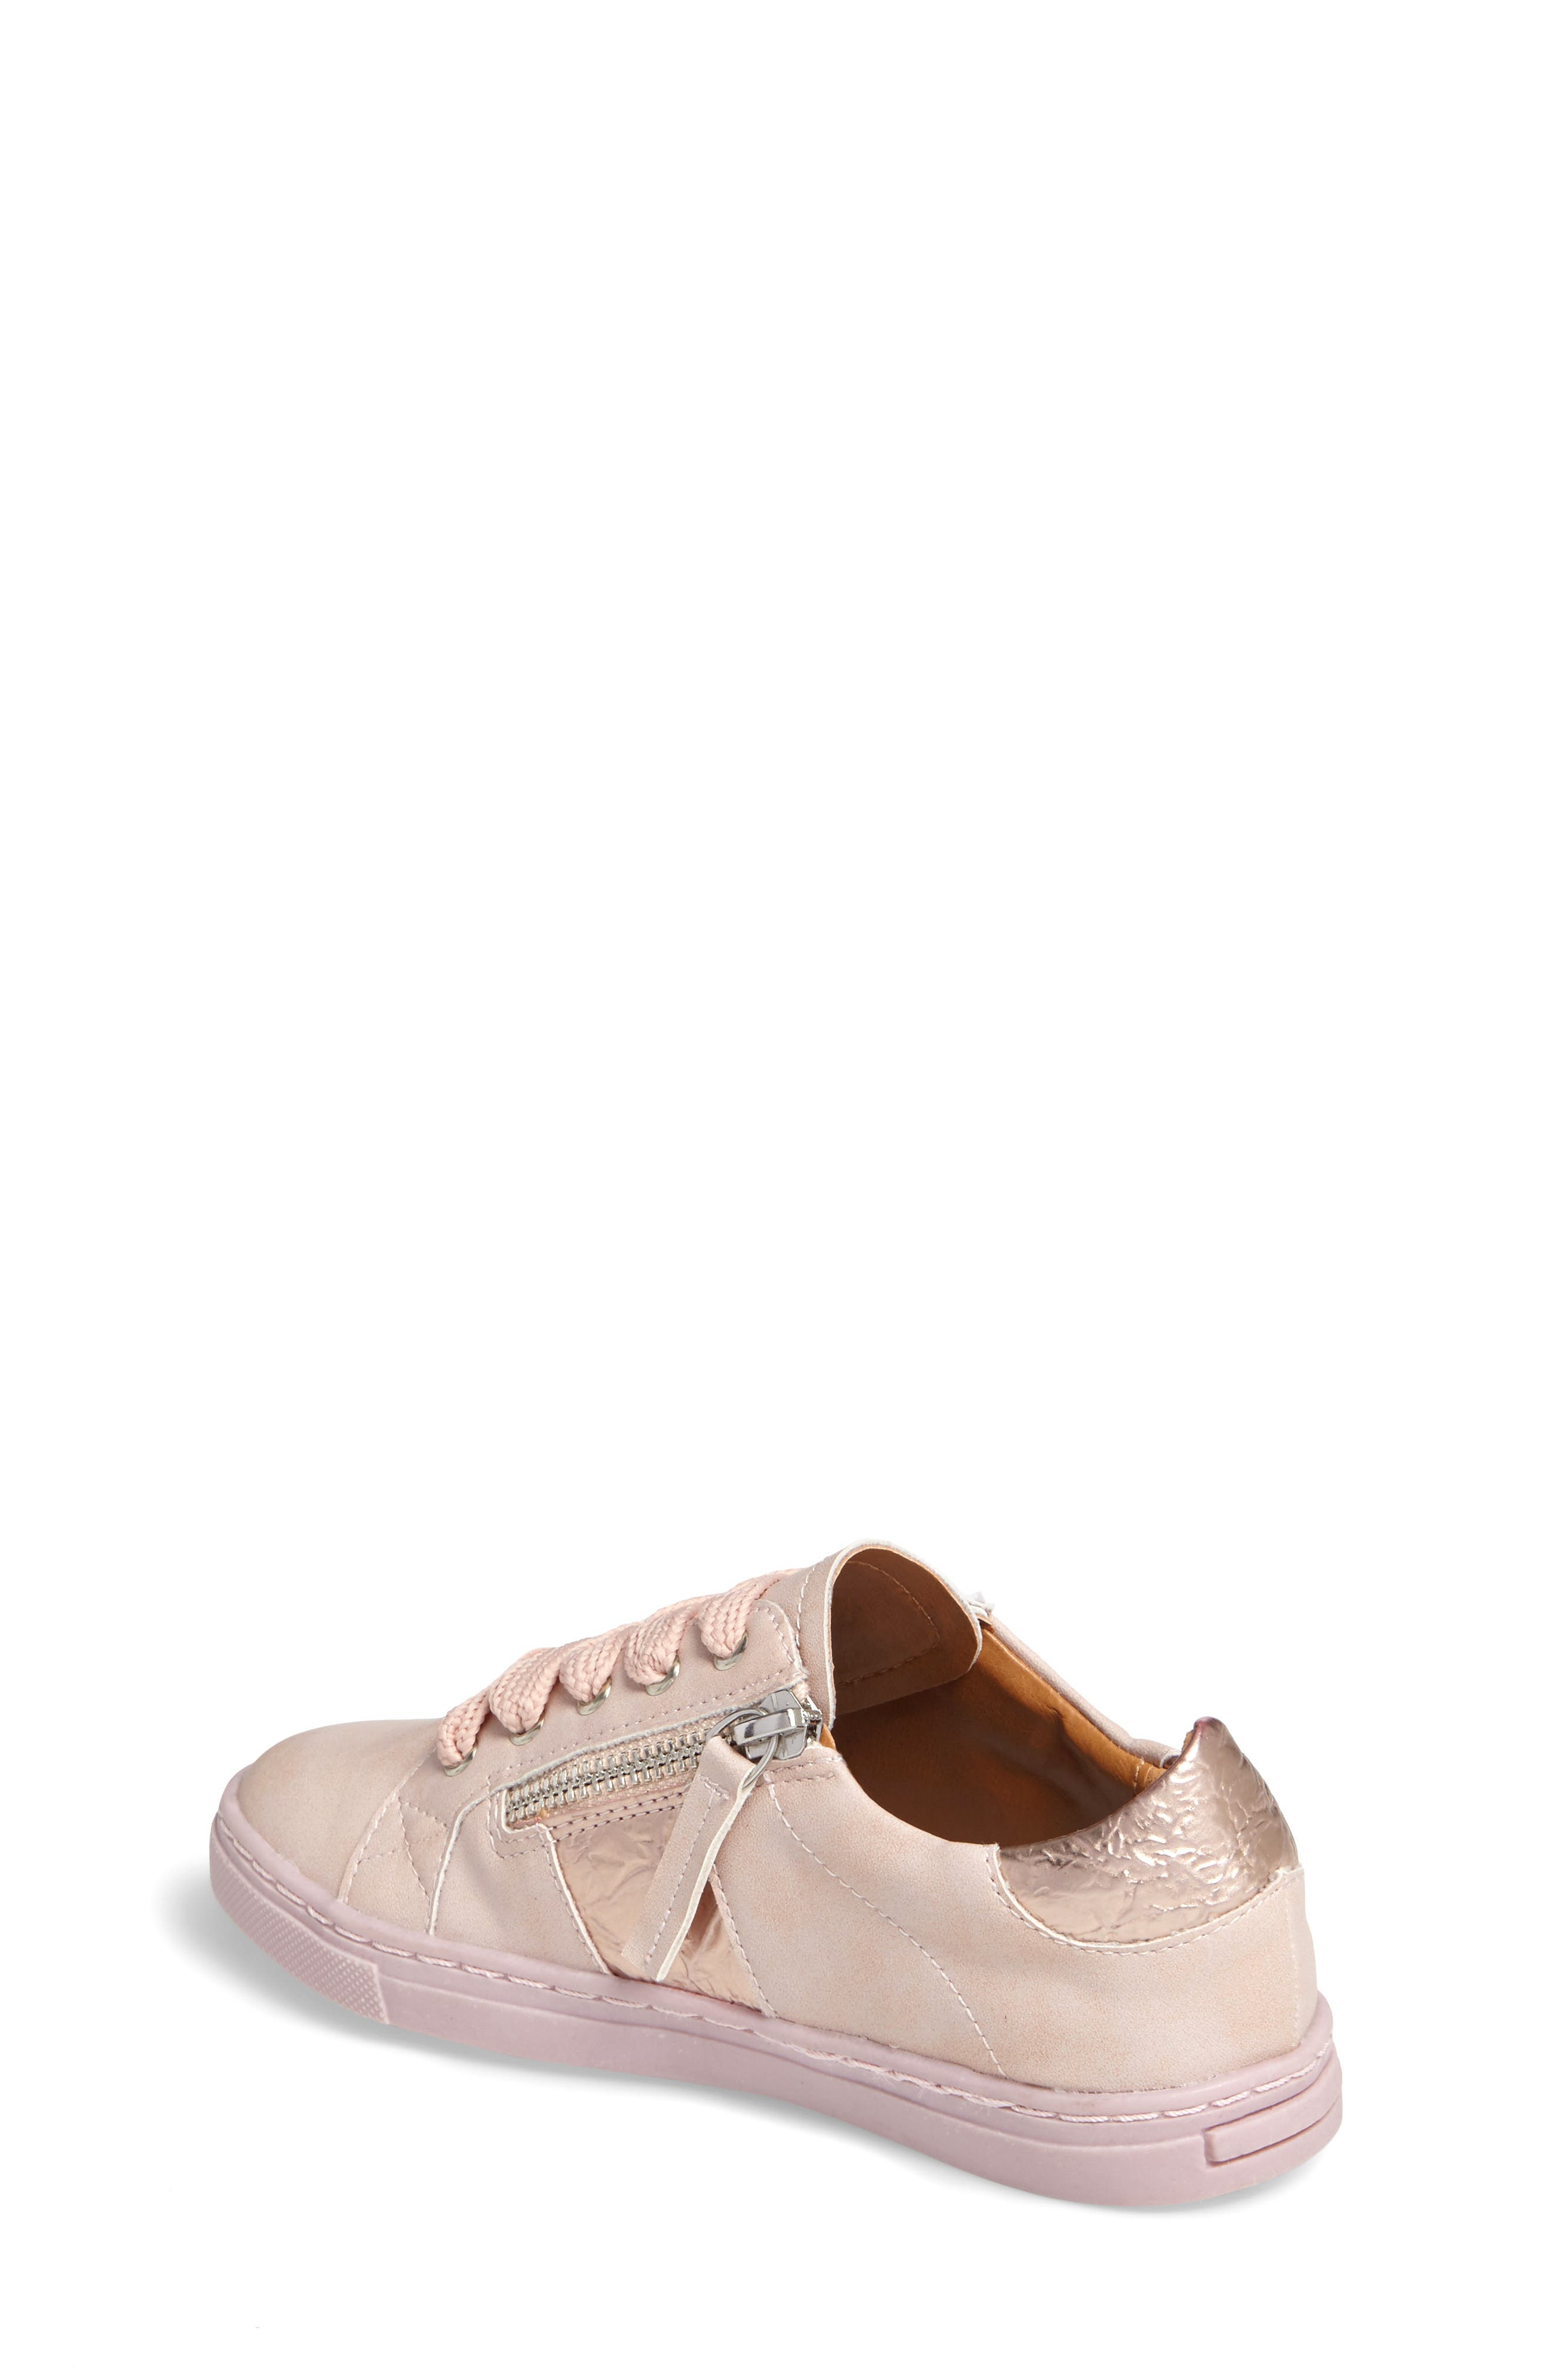 Alternate Image 2  - Dolce Vita Ziggy Sneaker (Toddler, Little Kid & Big Kid)